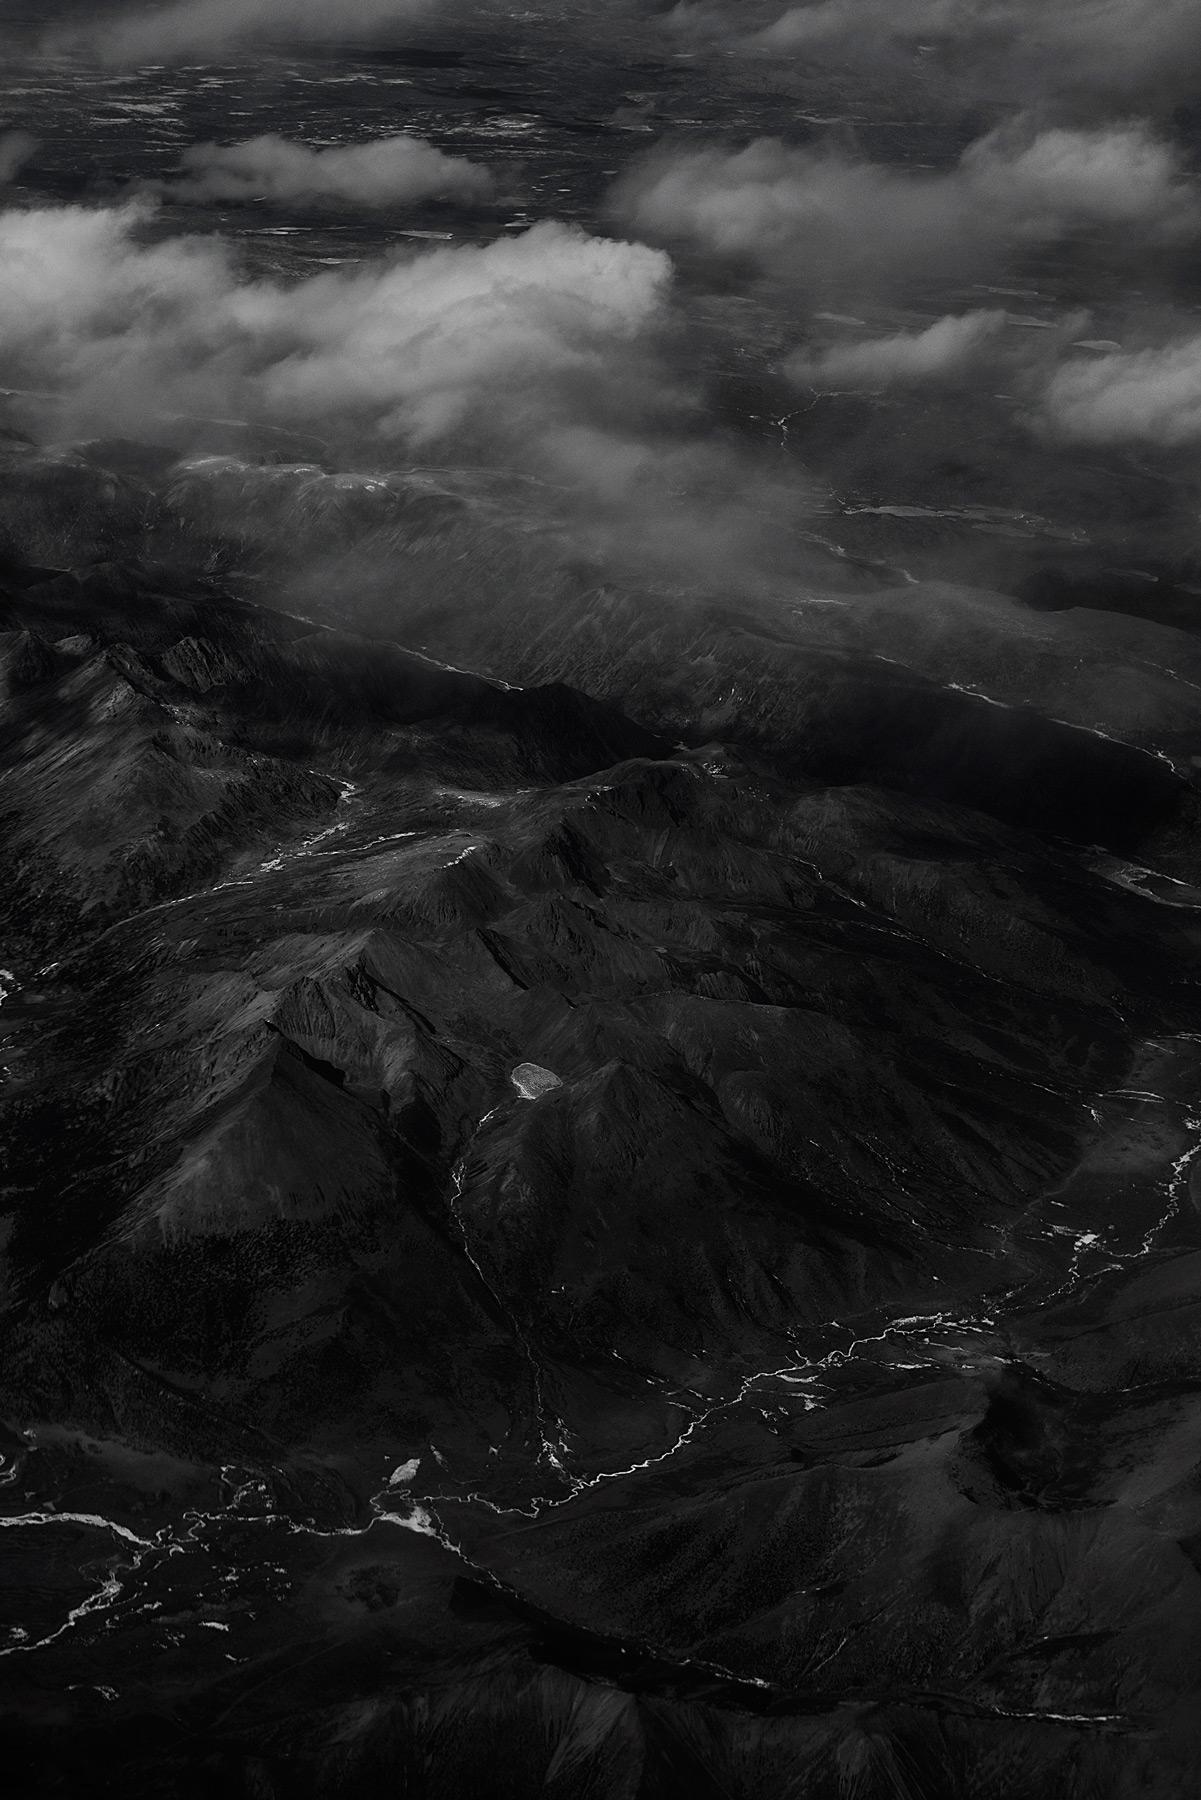 path-mountains-cloud-tibet-airport.jpg